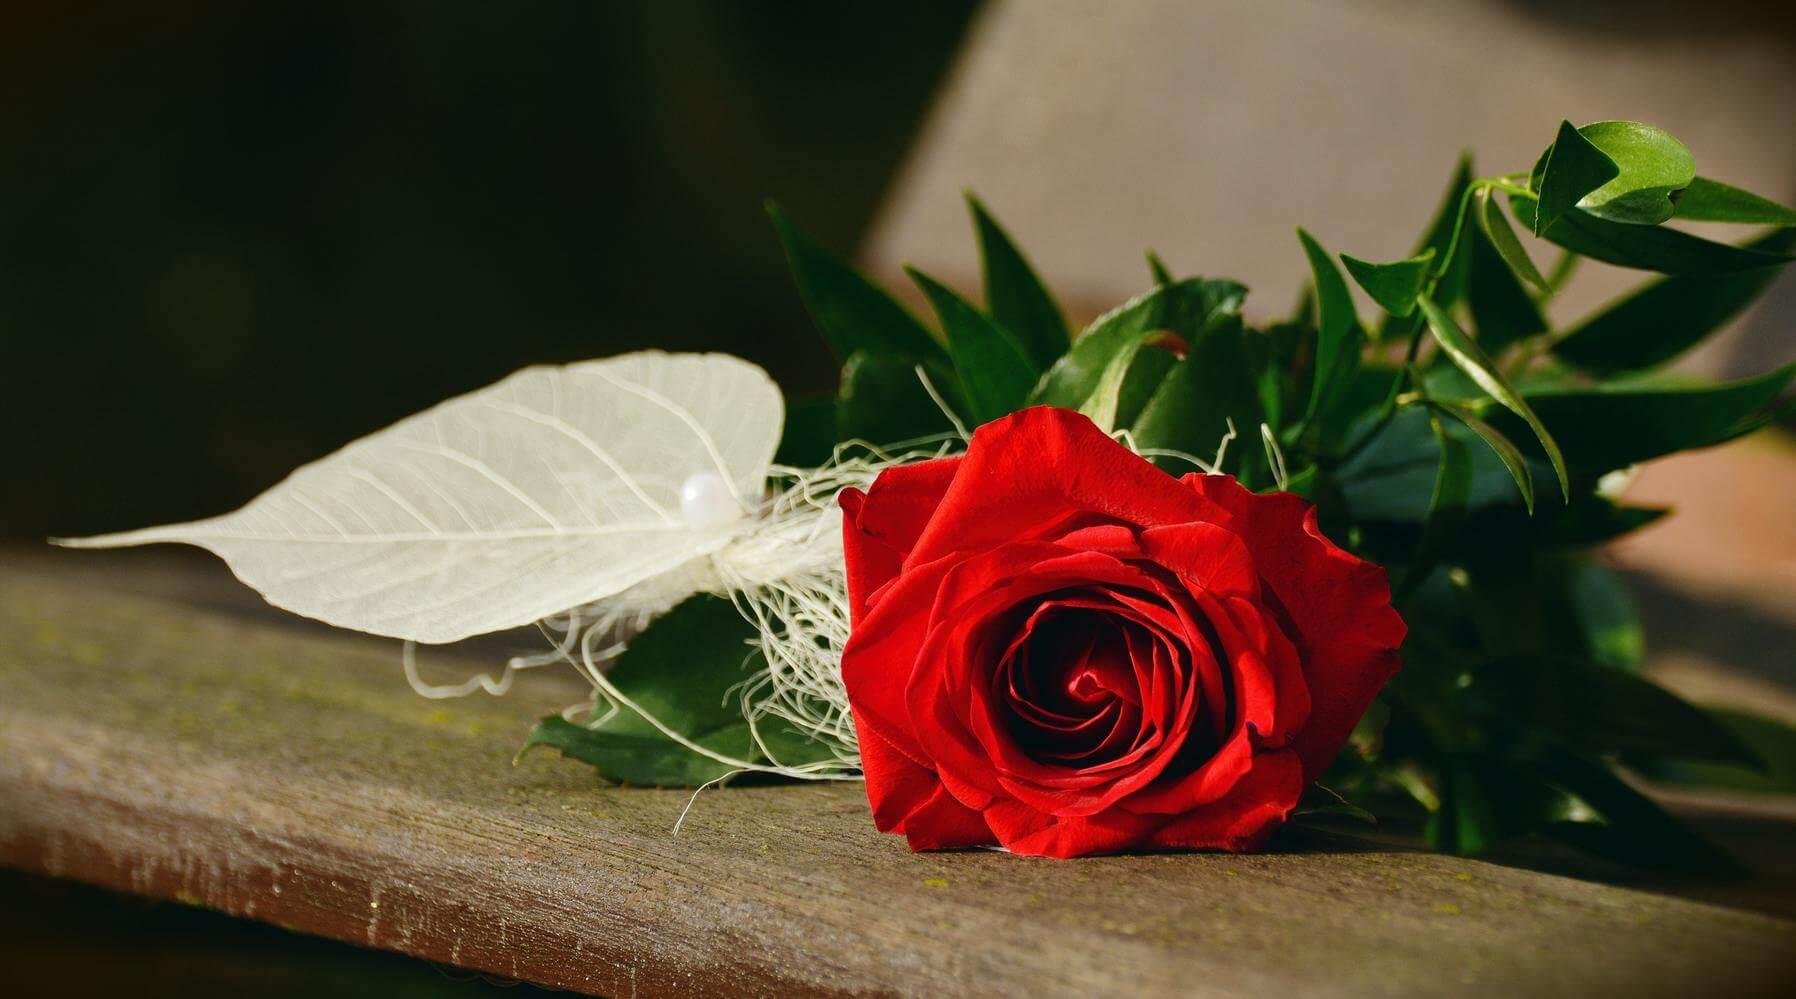 islamic love spells,islamic magic spells, love spells in islam,bring back lost lover,fix all relationship problems